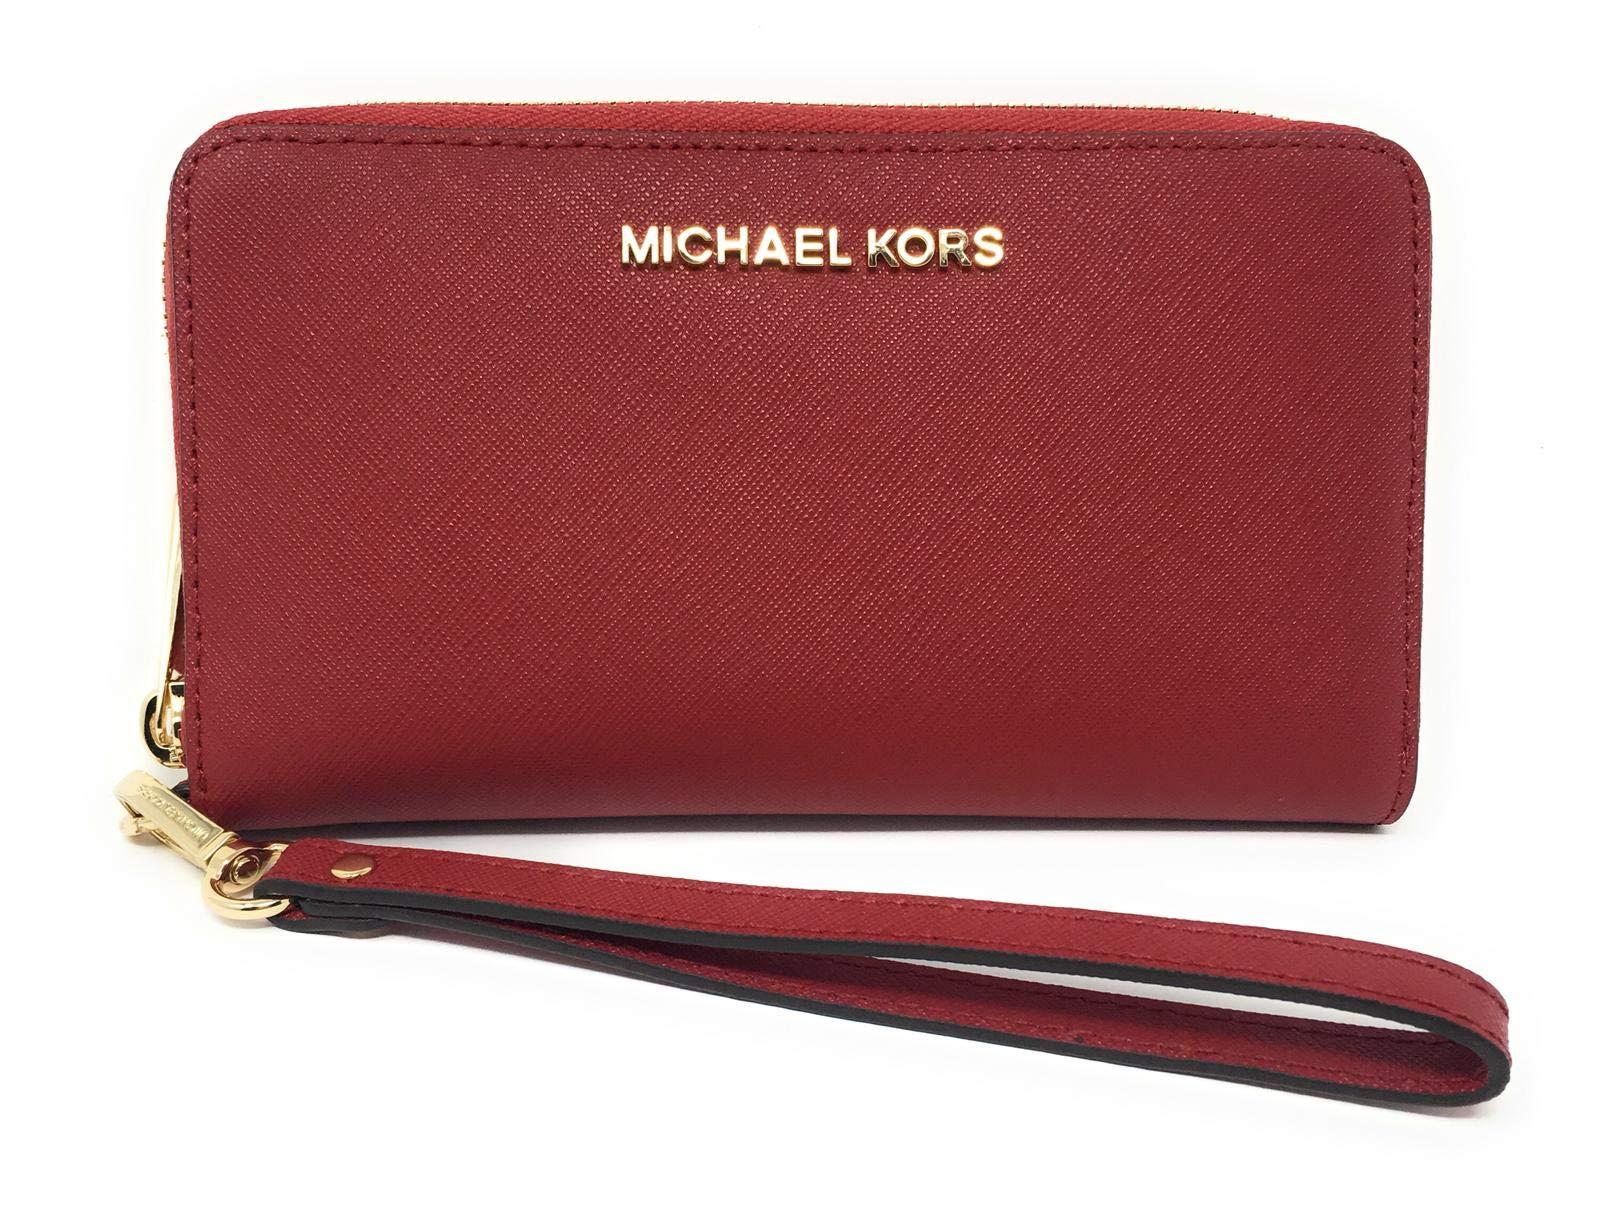 Michael Kors Women's Jet Set Travel Large Smartphone Wristlet (Scarlet)